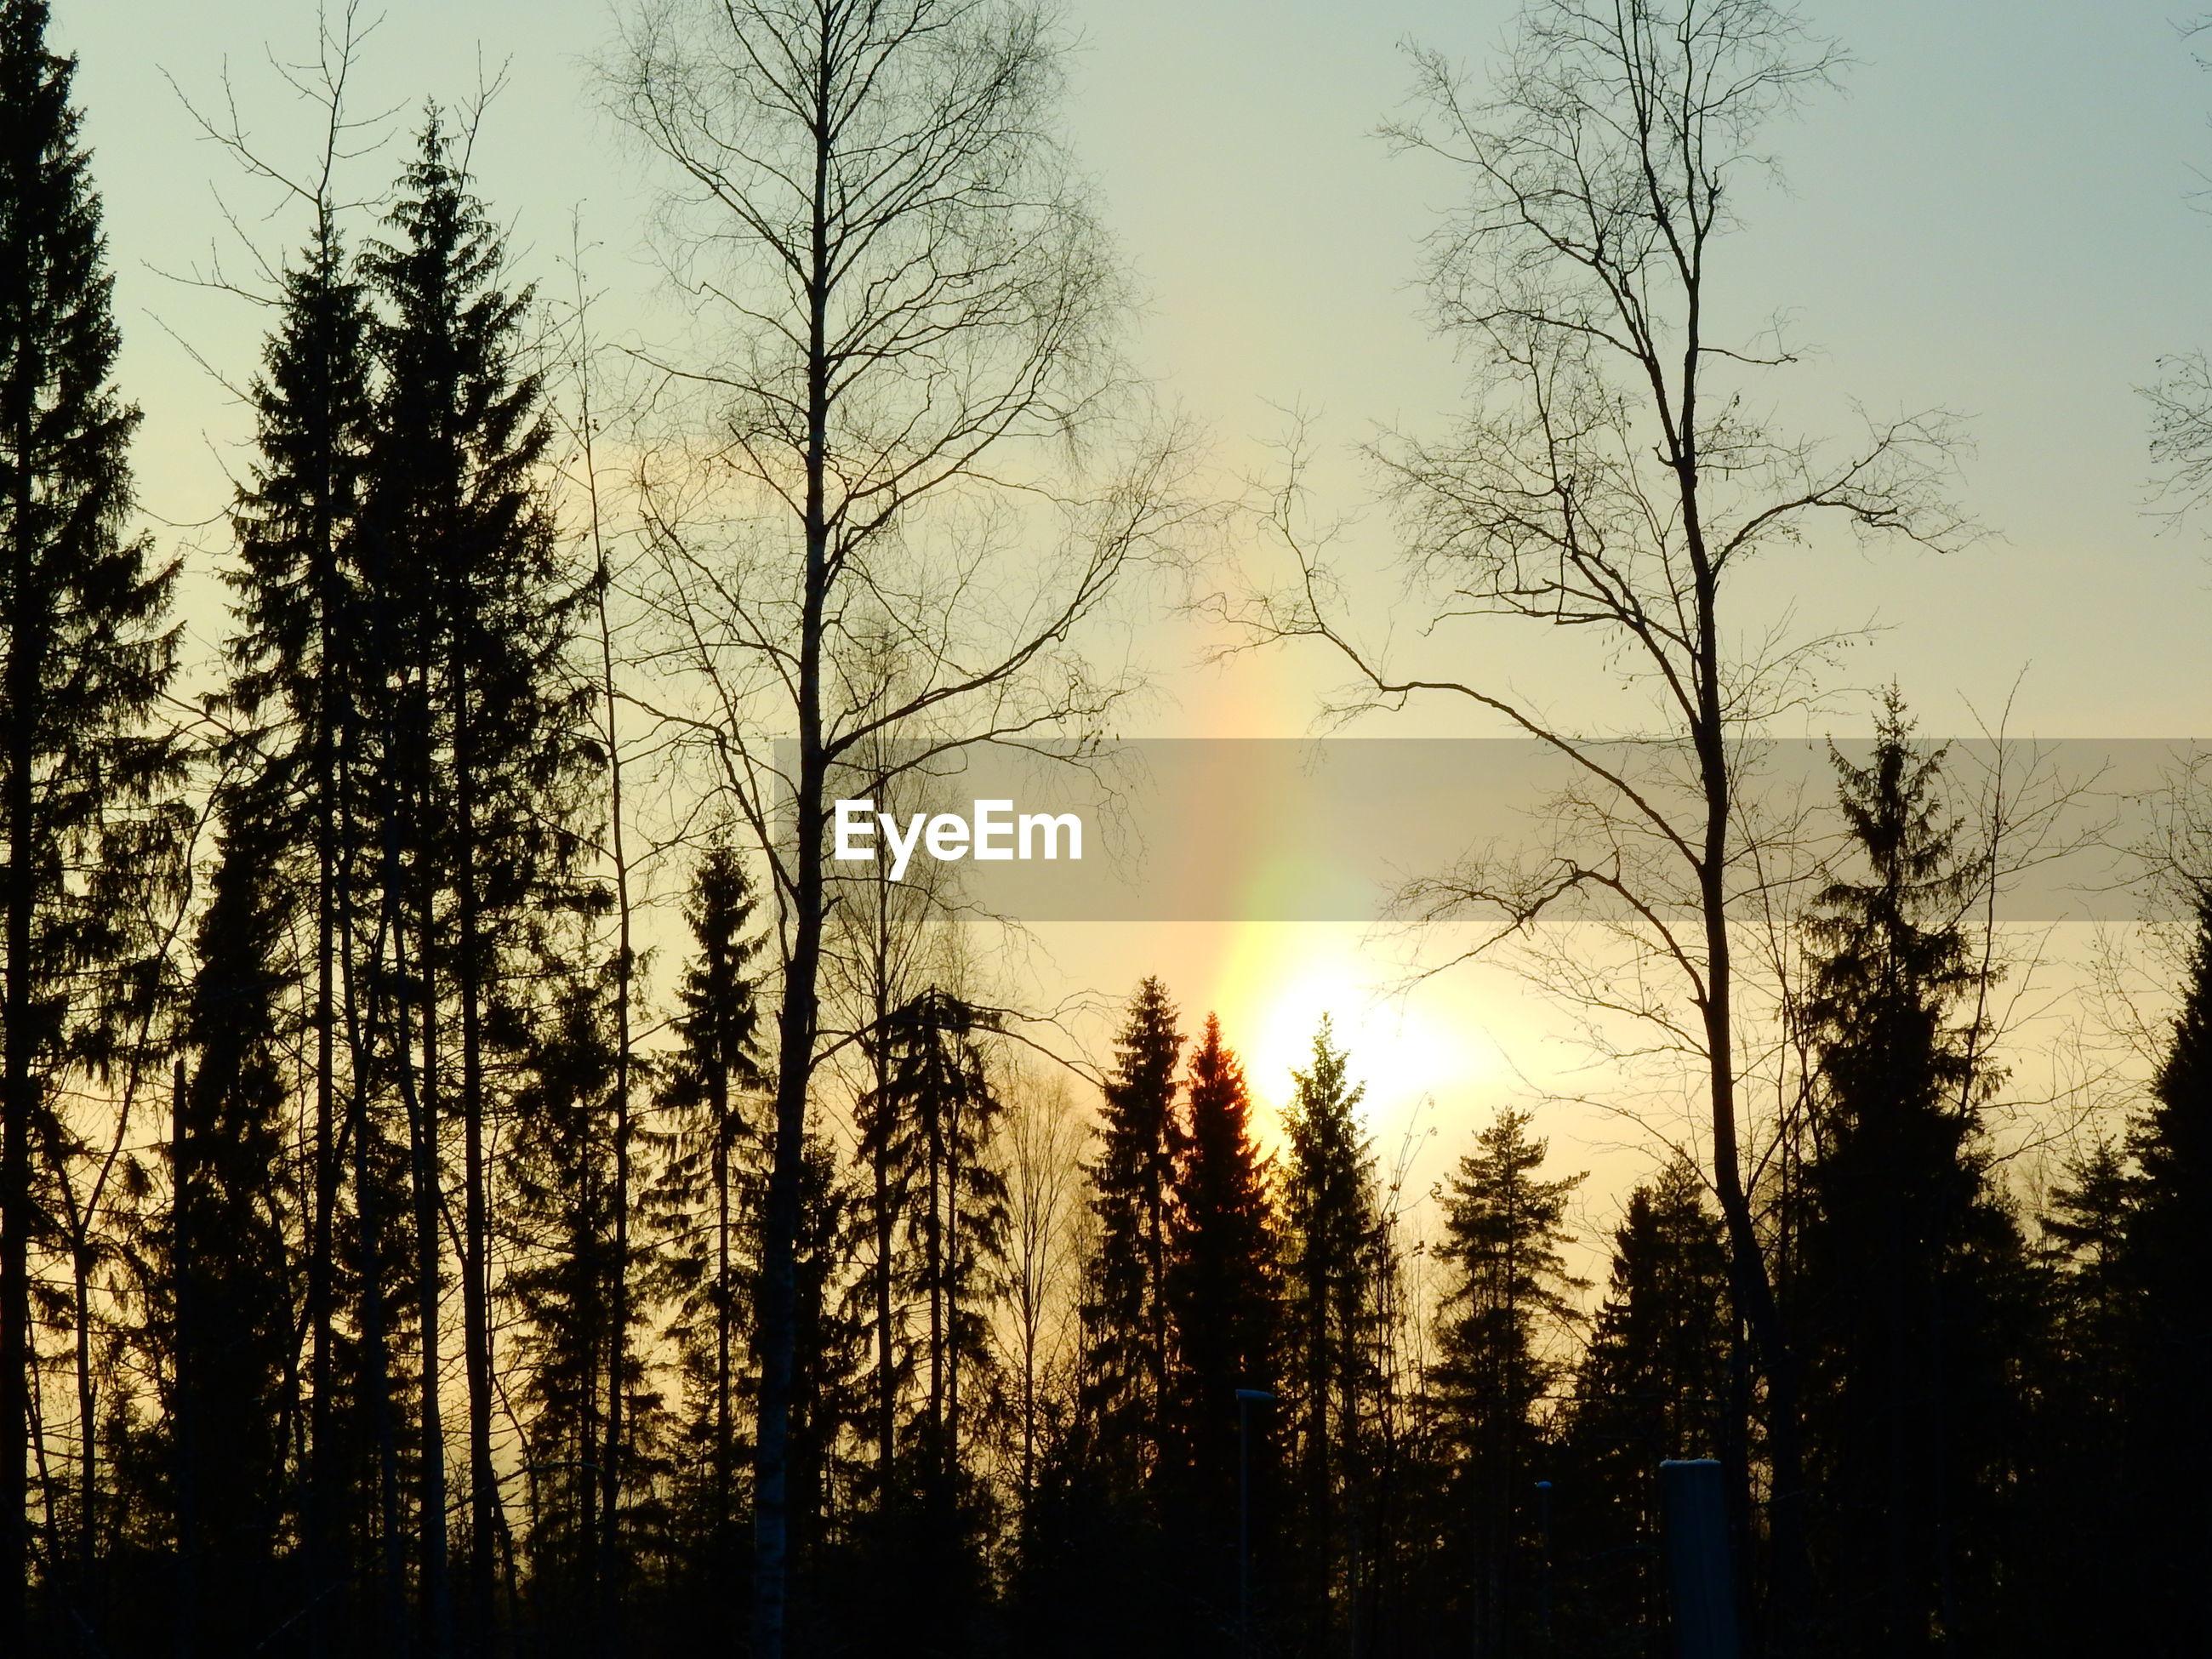 Silhouette trees against sky during dusk